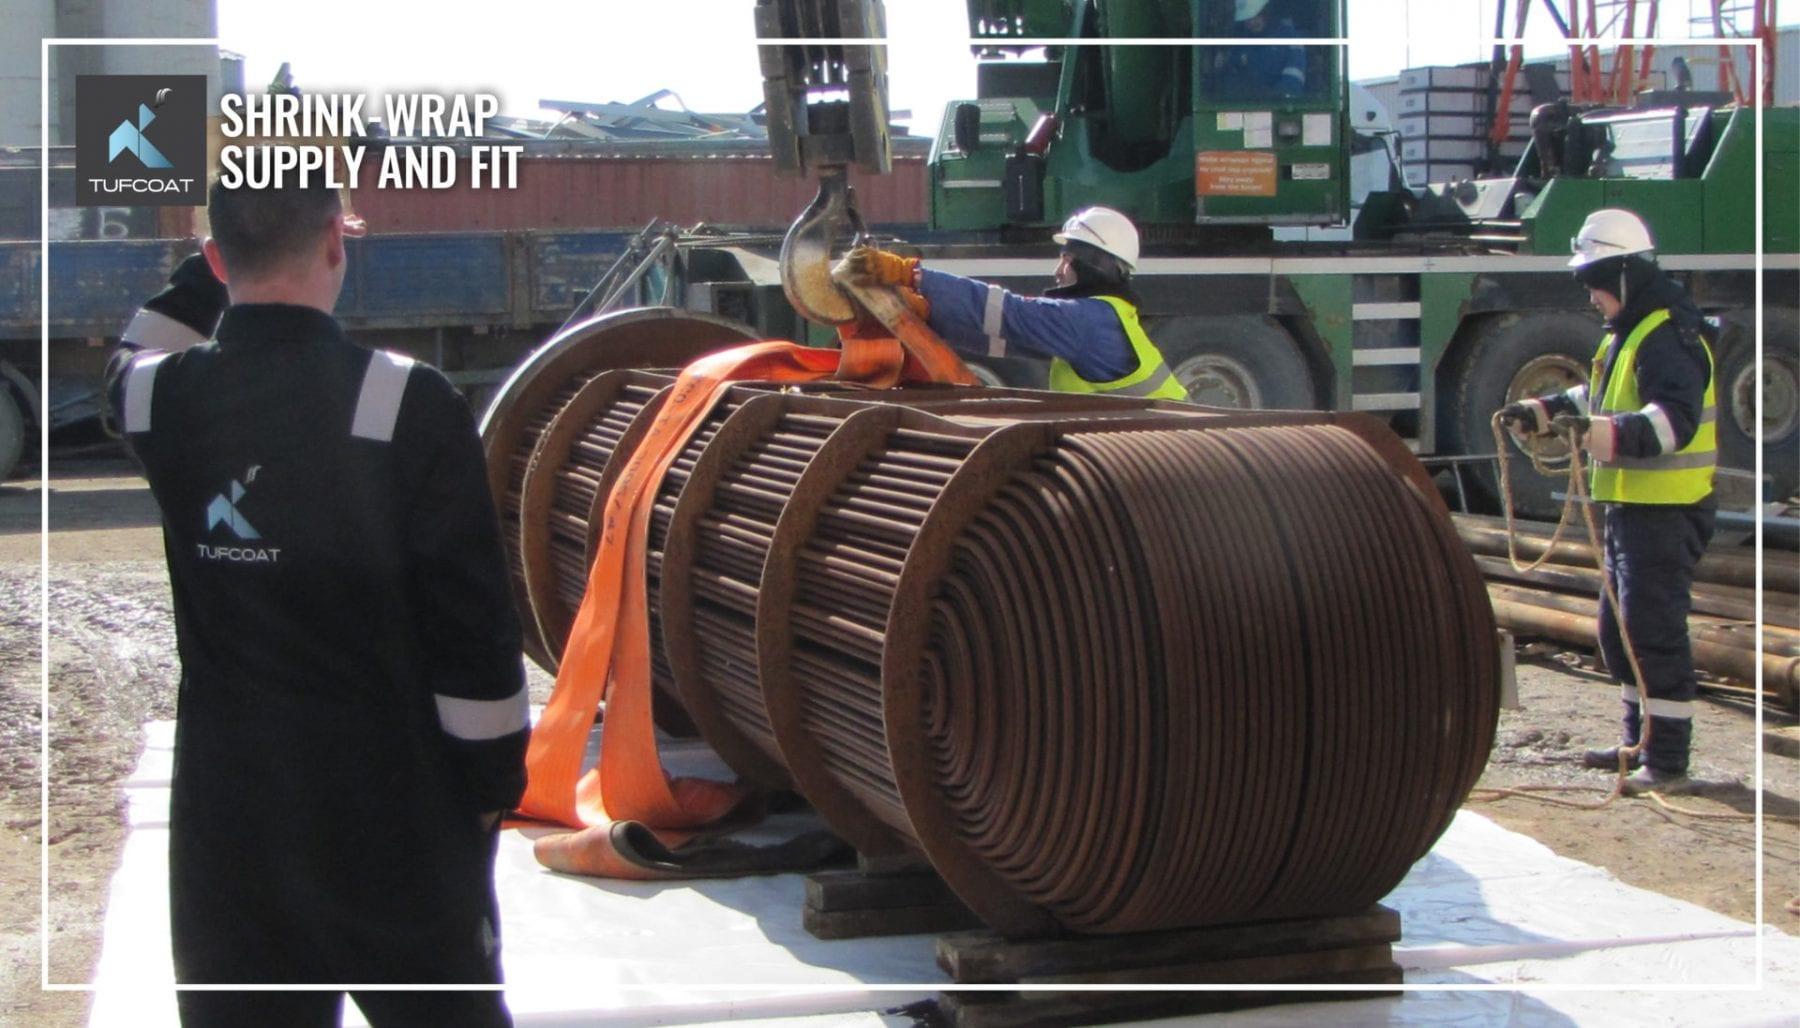 Tufcoat-Shrink-wrap-scaffold-shrink-wrap-training-and-supply